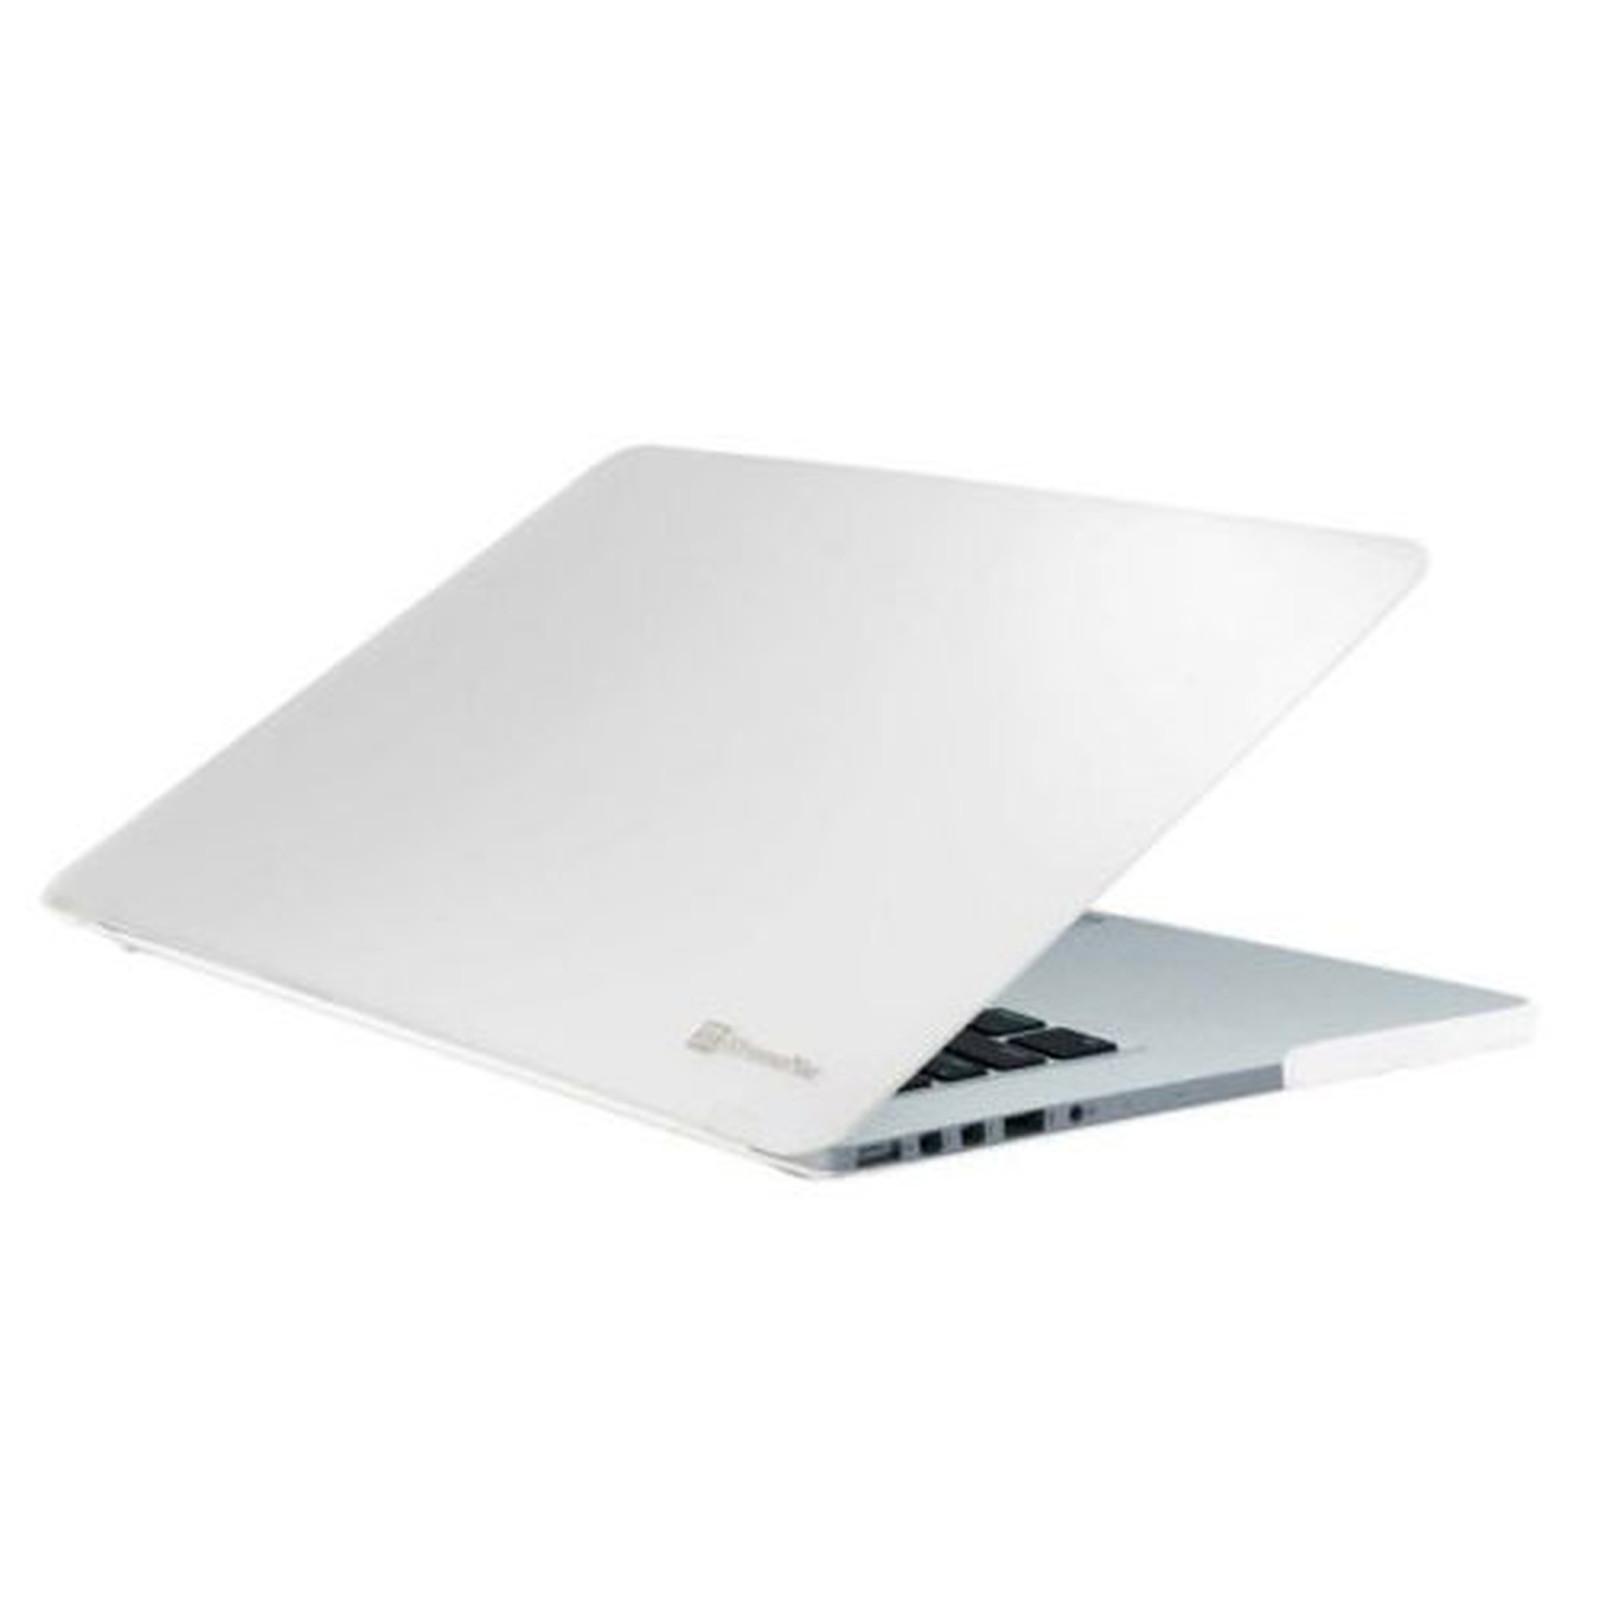 "XtremeMac Microshield MacBook Pro 13"" (Transparent)"